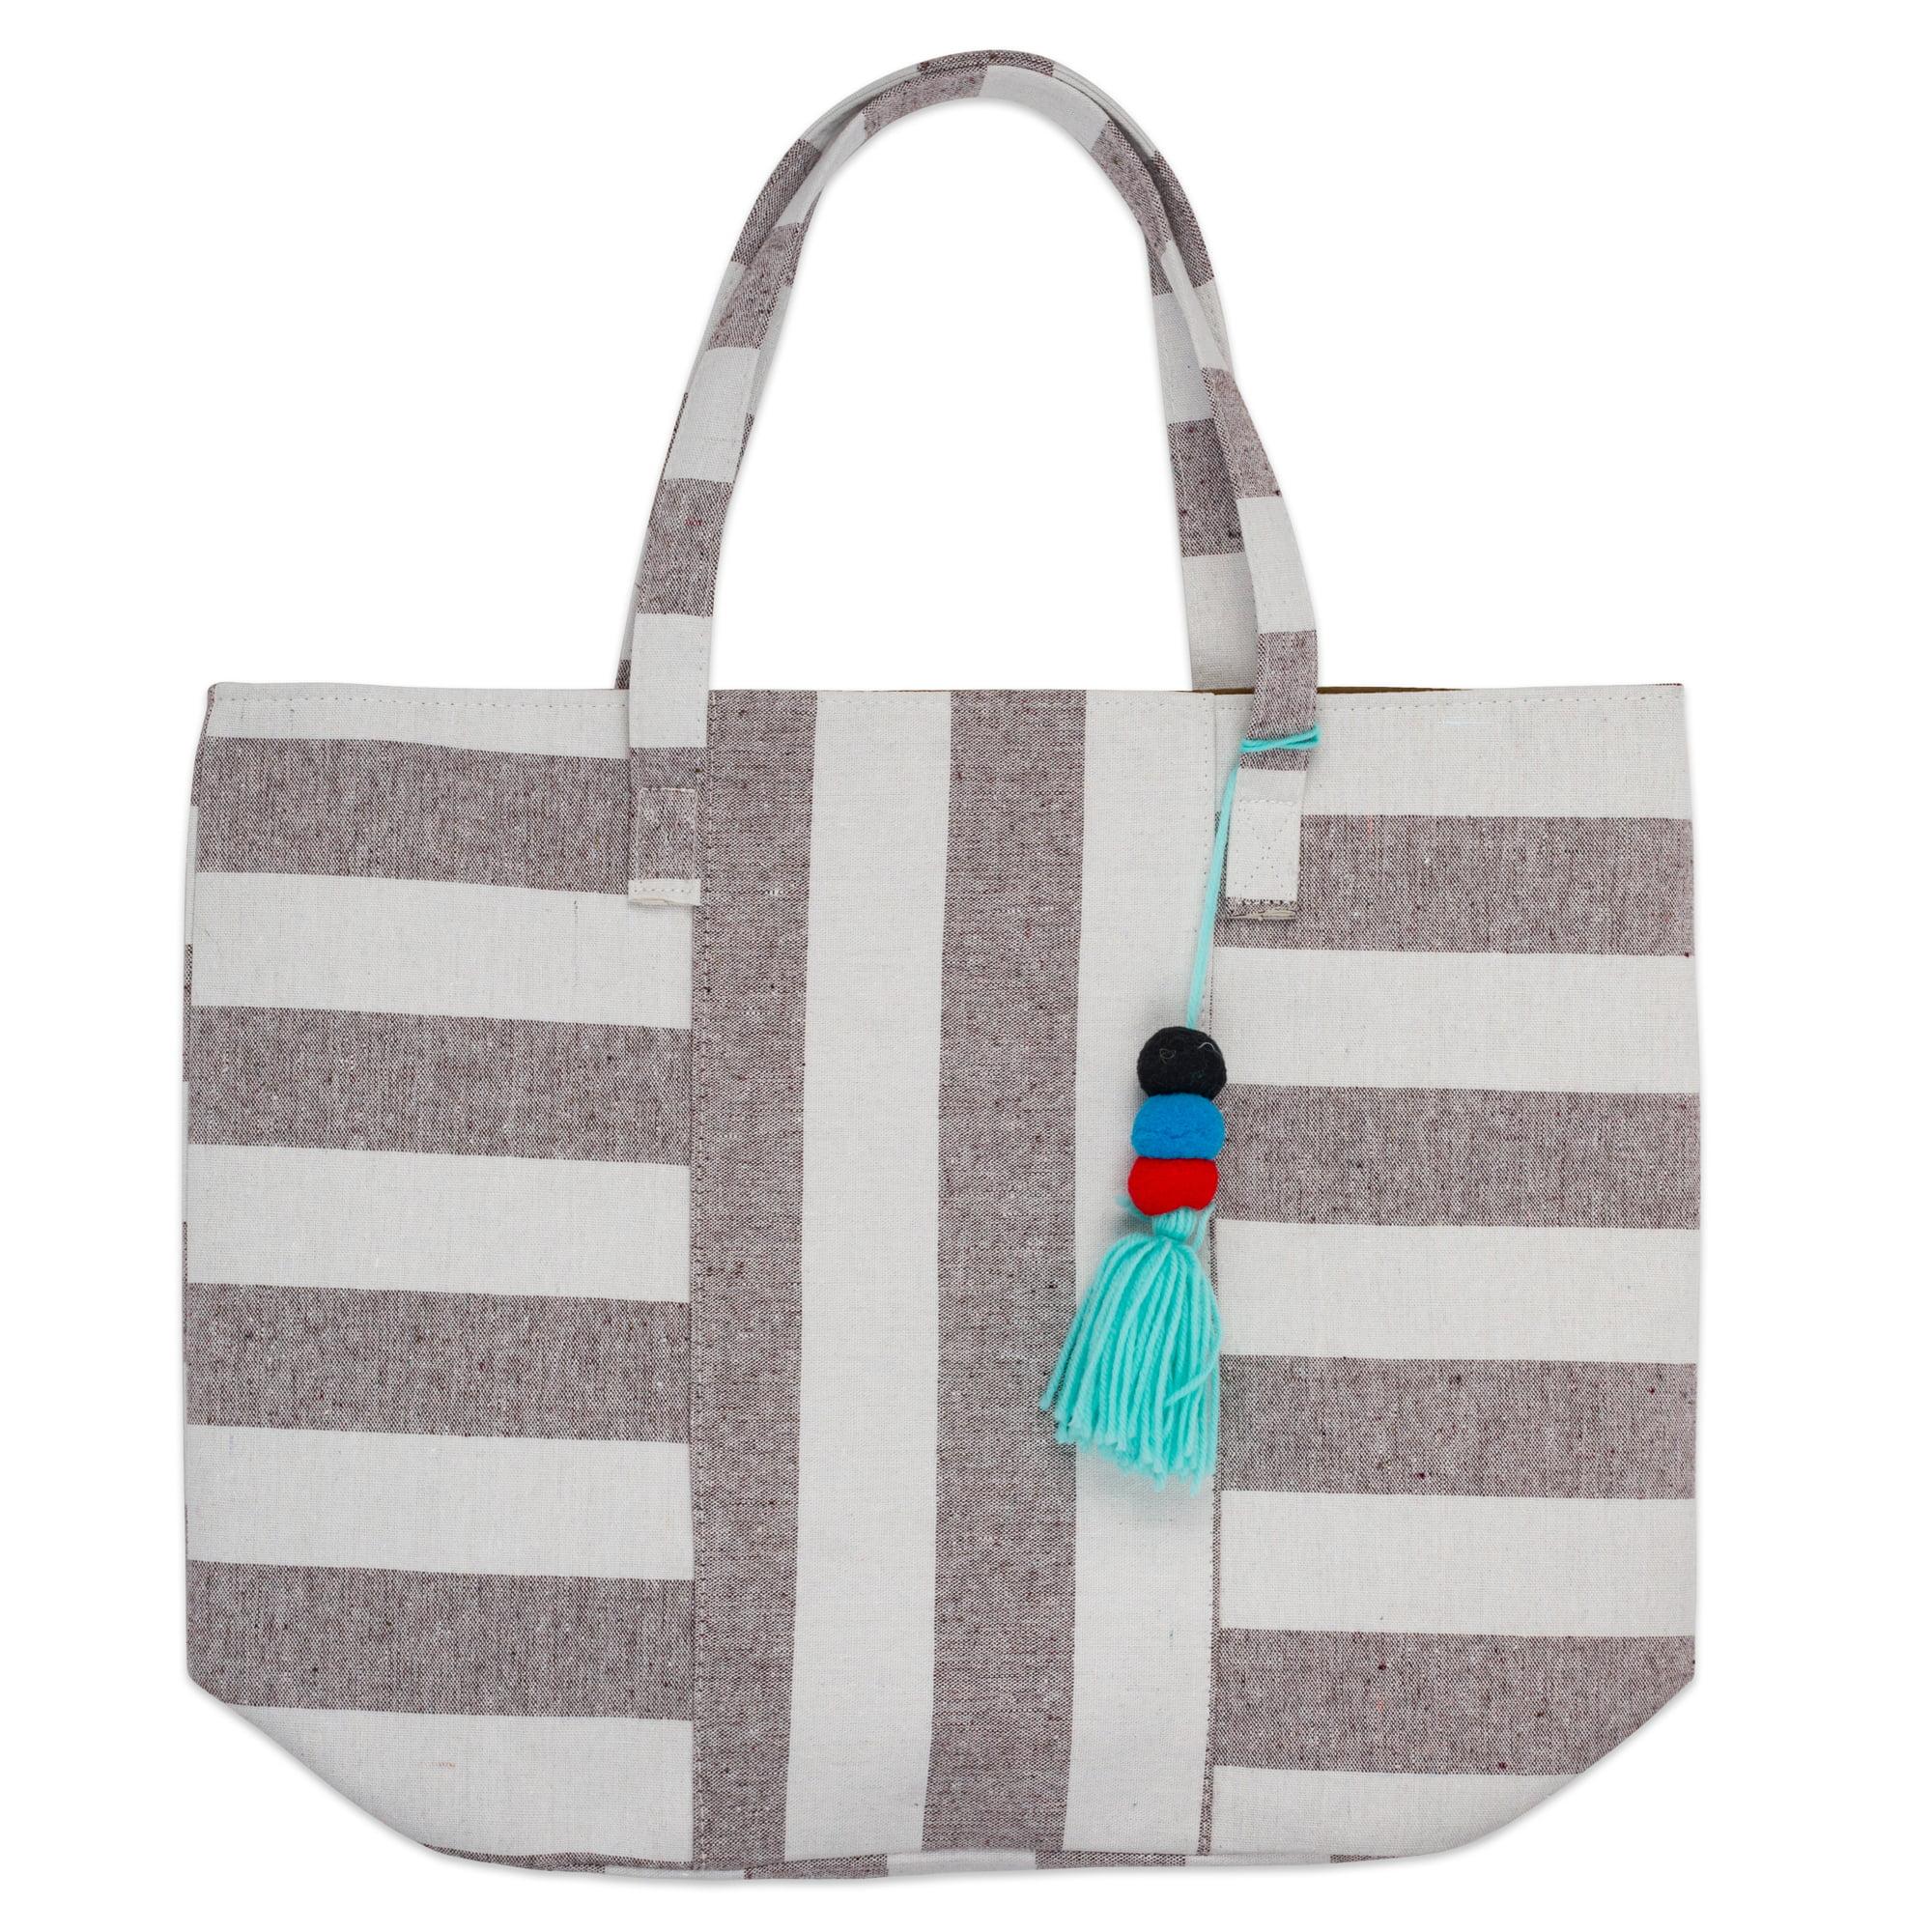 Boho Tote Bag READY TO SHIP Beach Bag The Coral Large Boho Bag